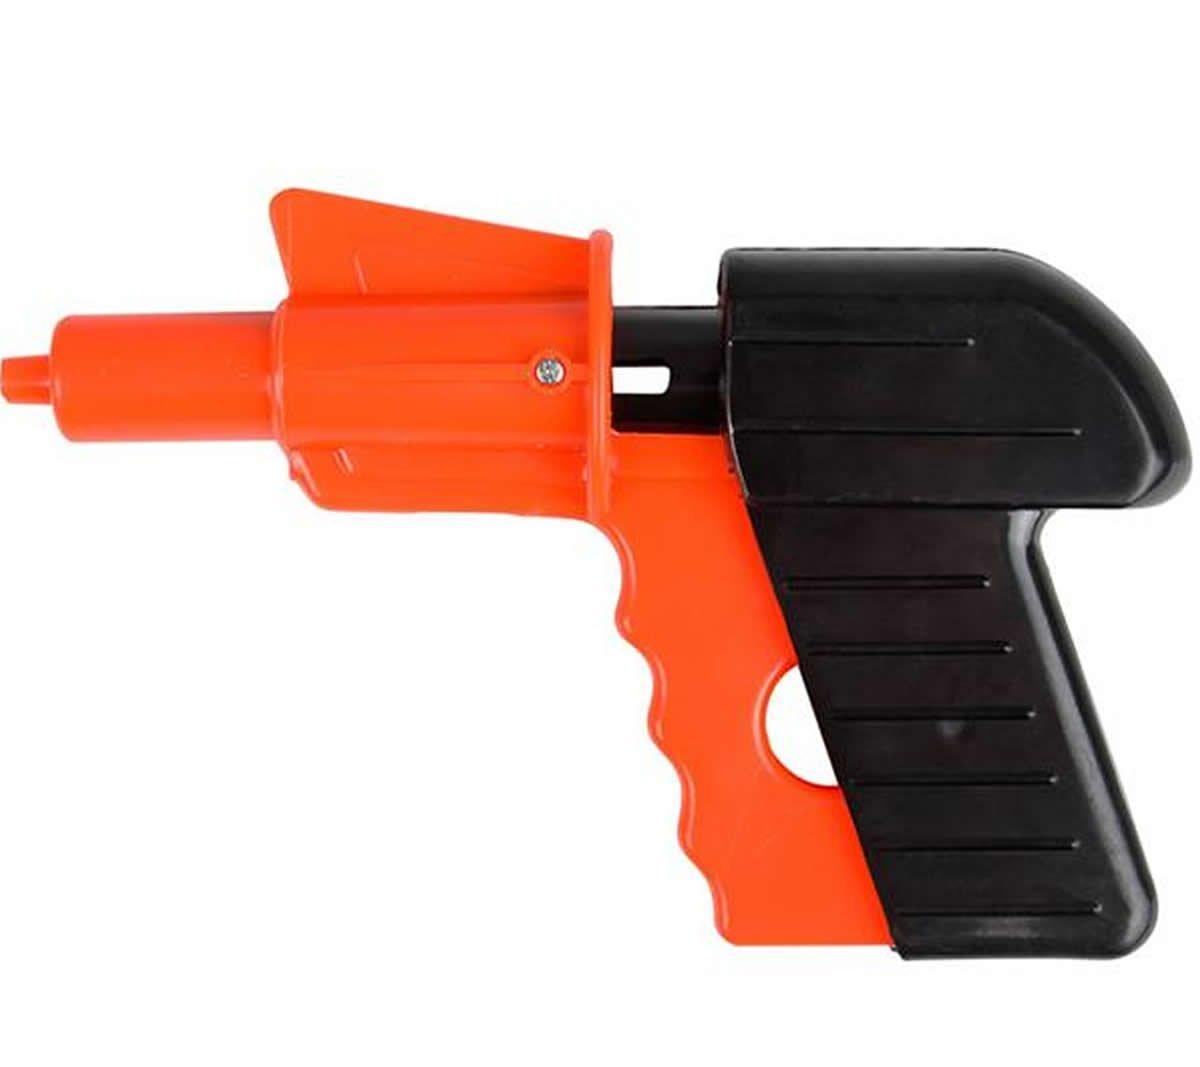 Retro Potato Plastic Toy Gun